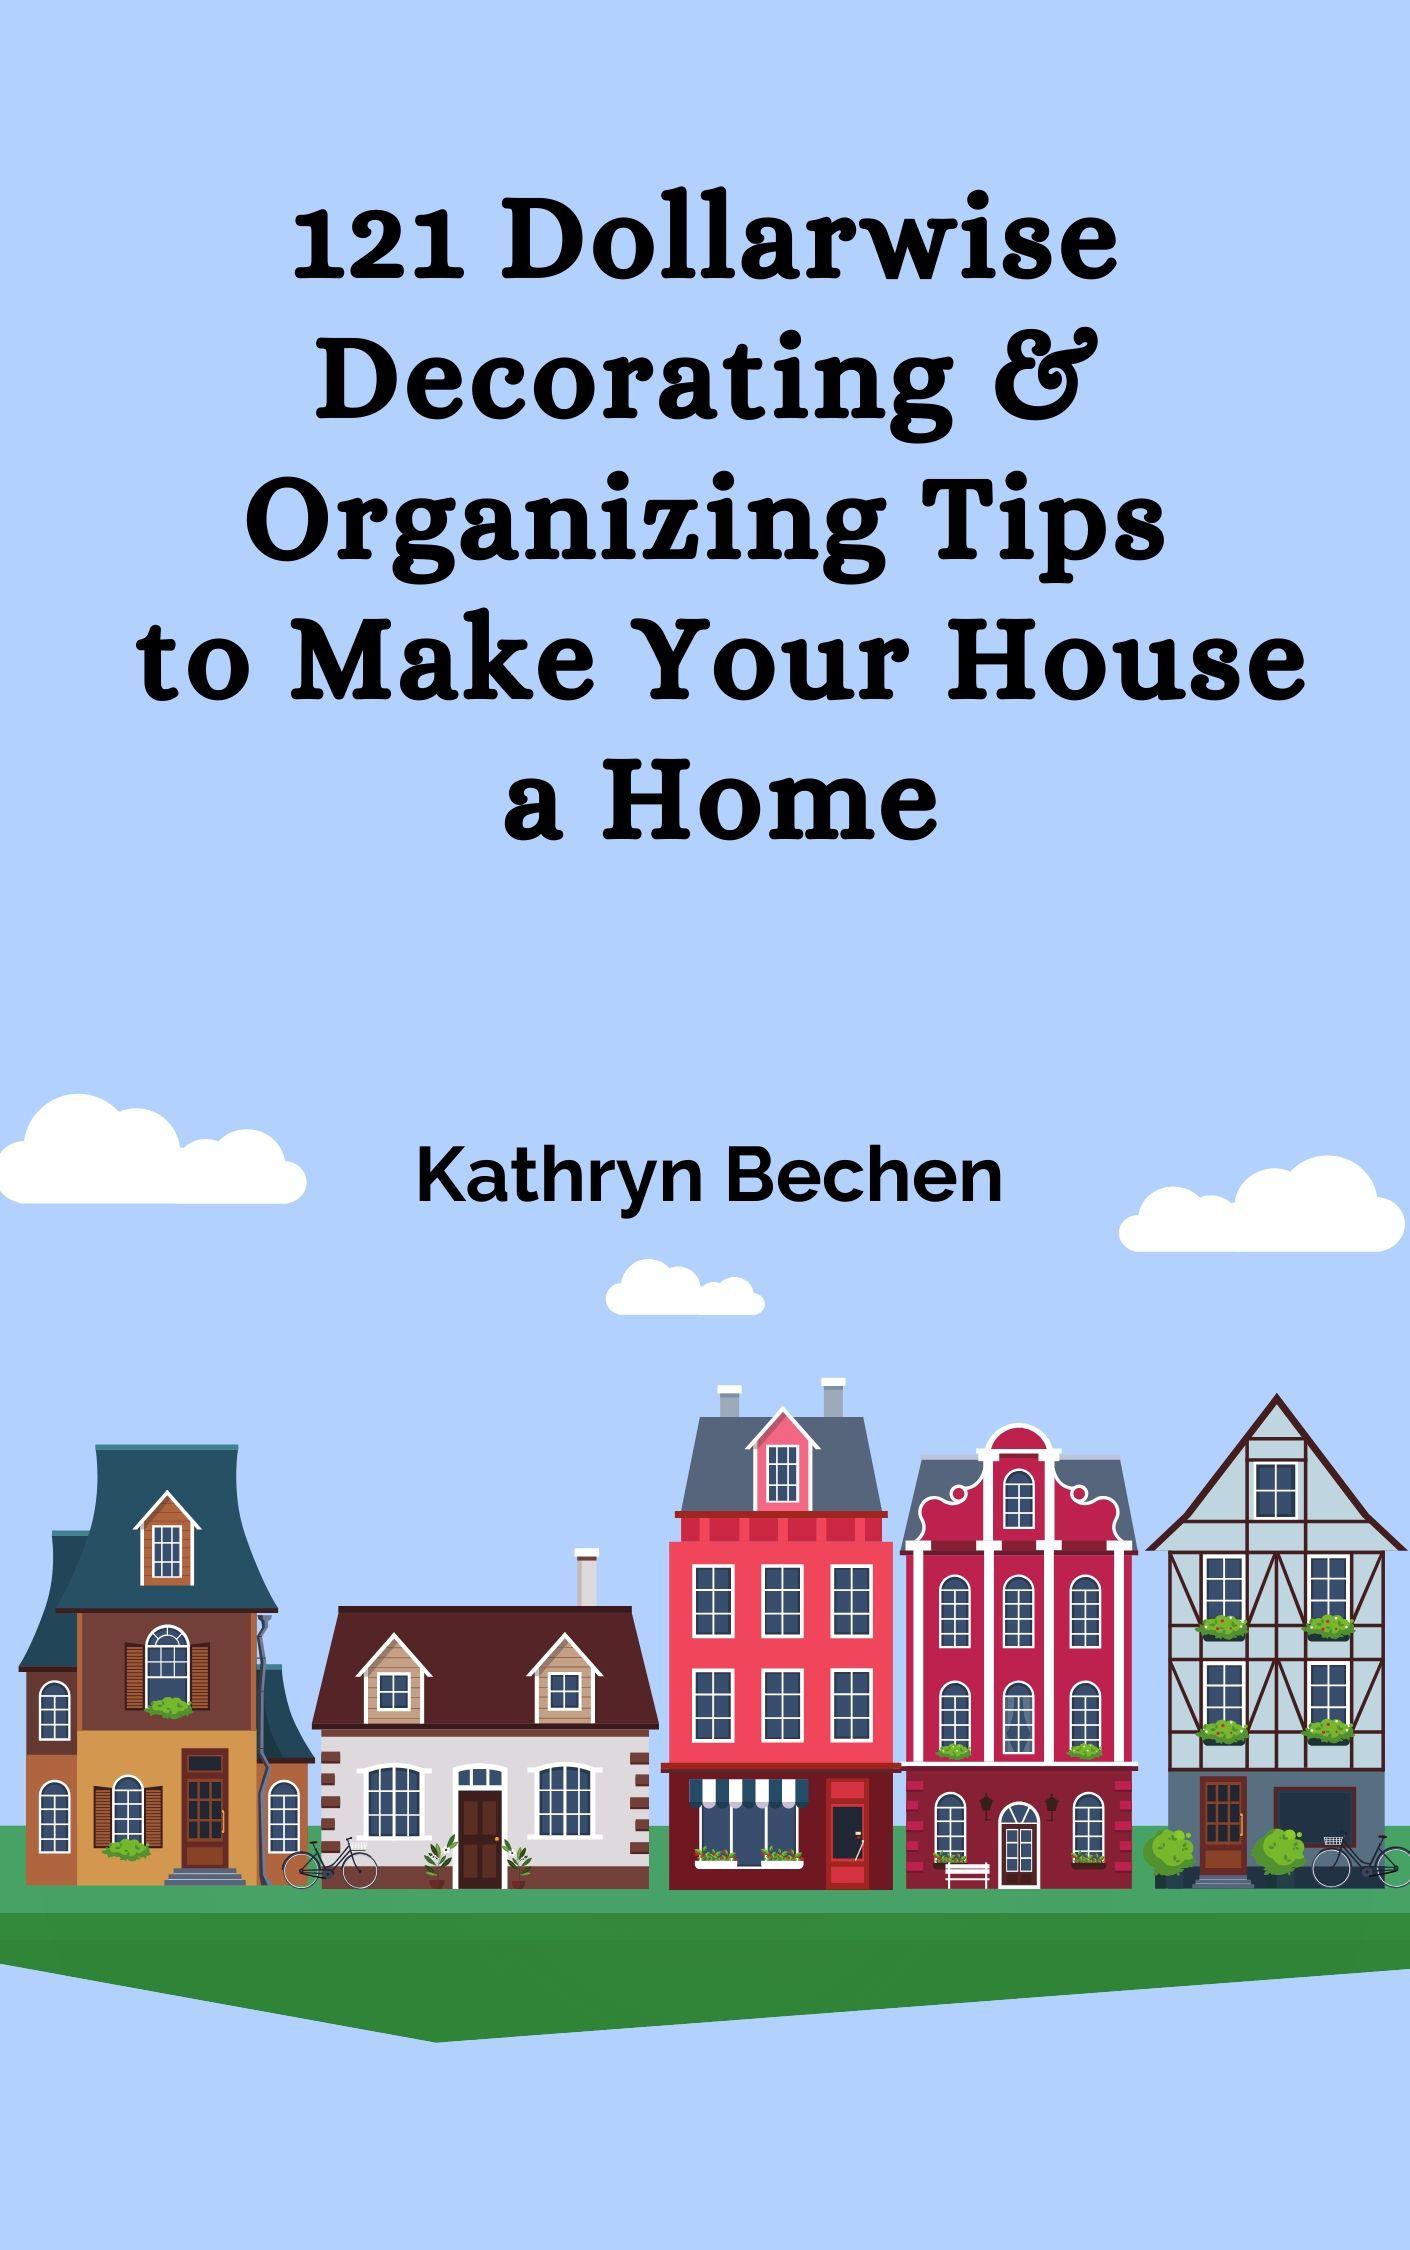 121 Dollarwise Decorating & Organizing Tips Kathryn Bechen